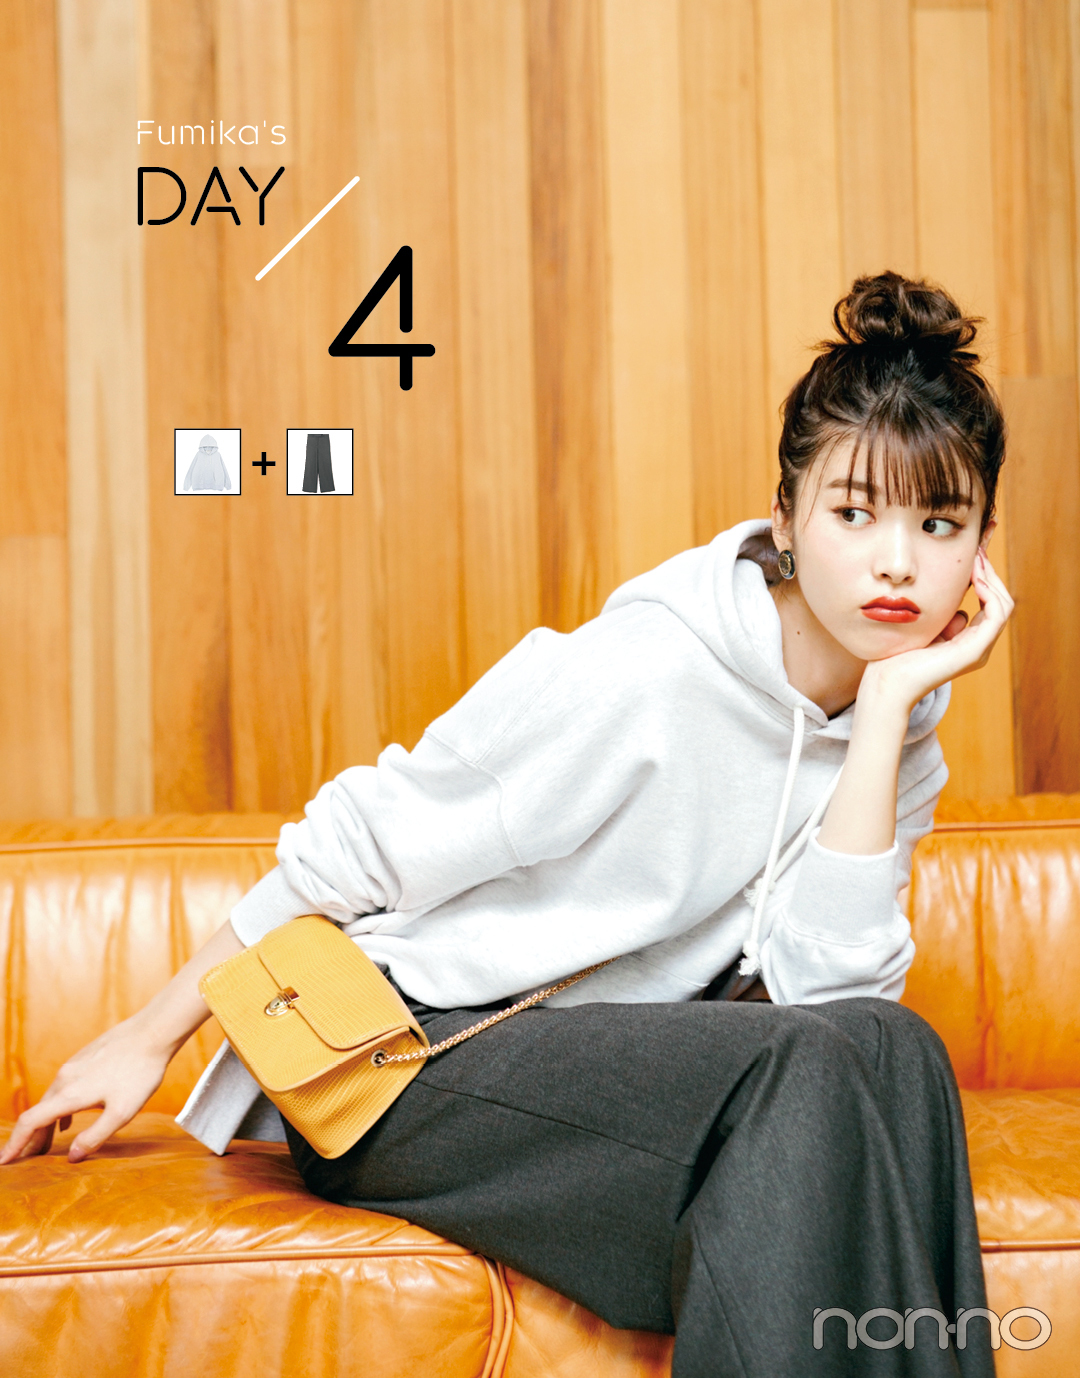 Fumika's DAY4